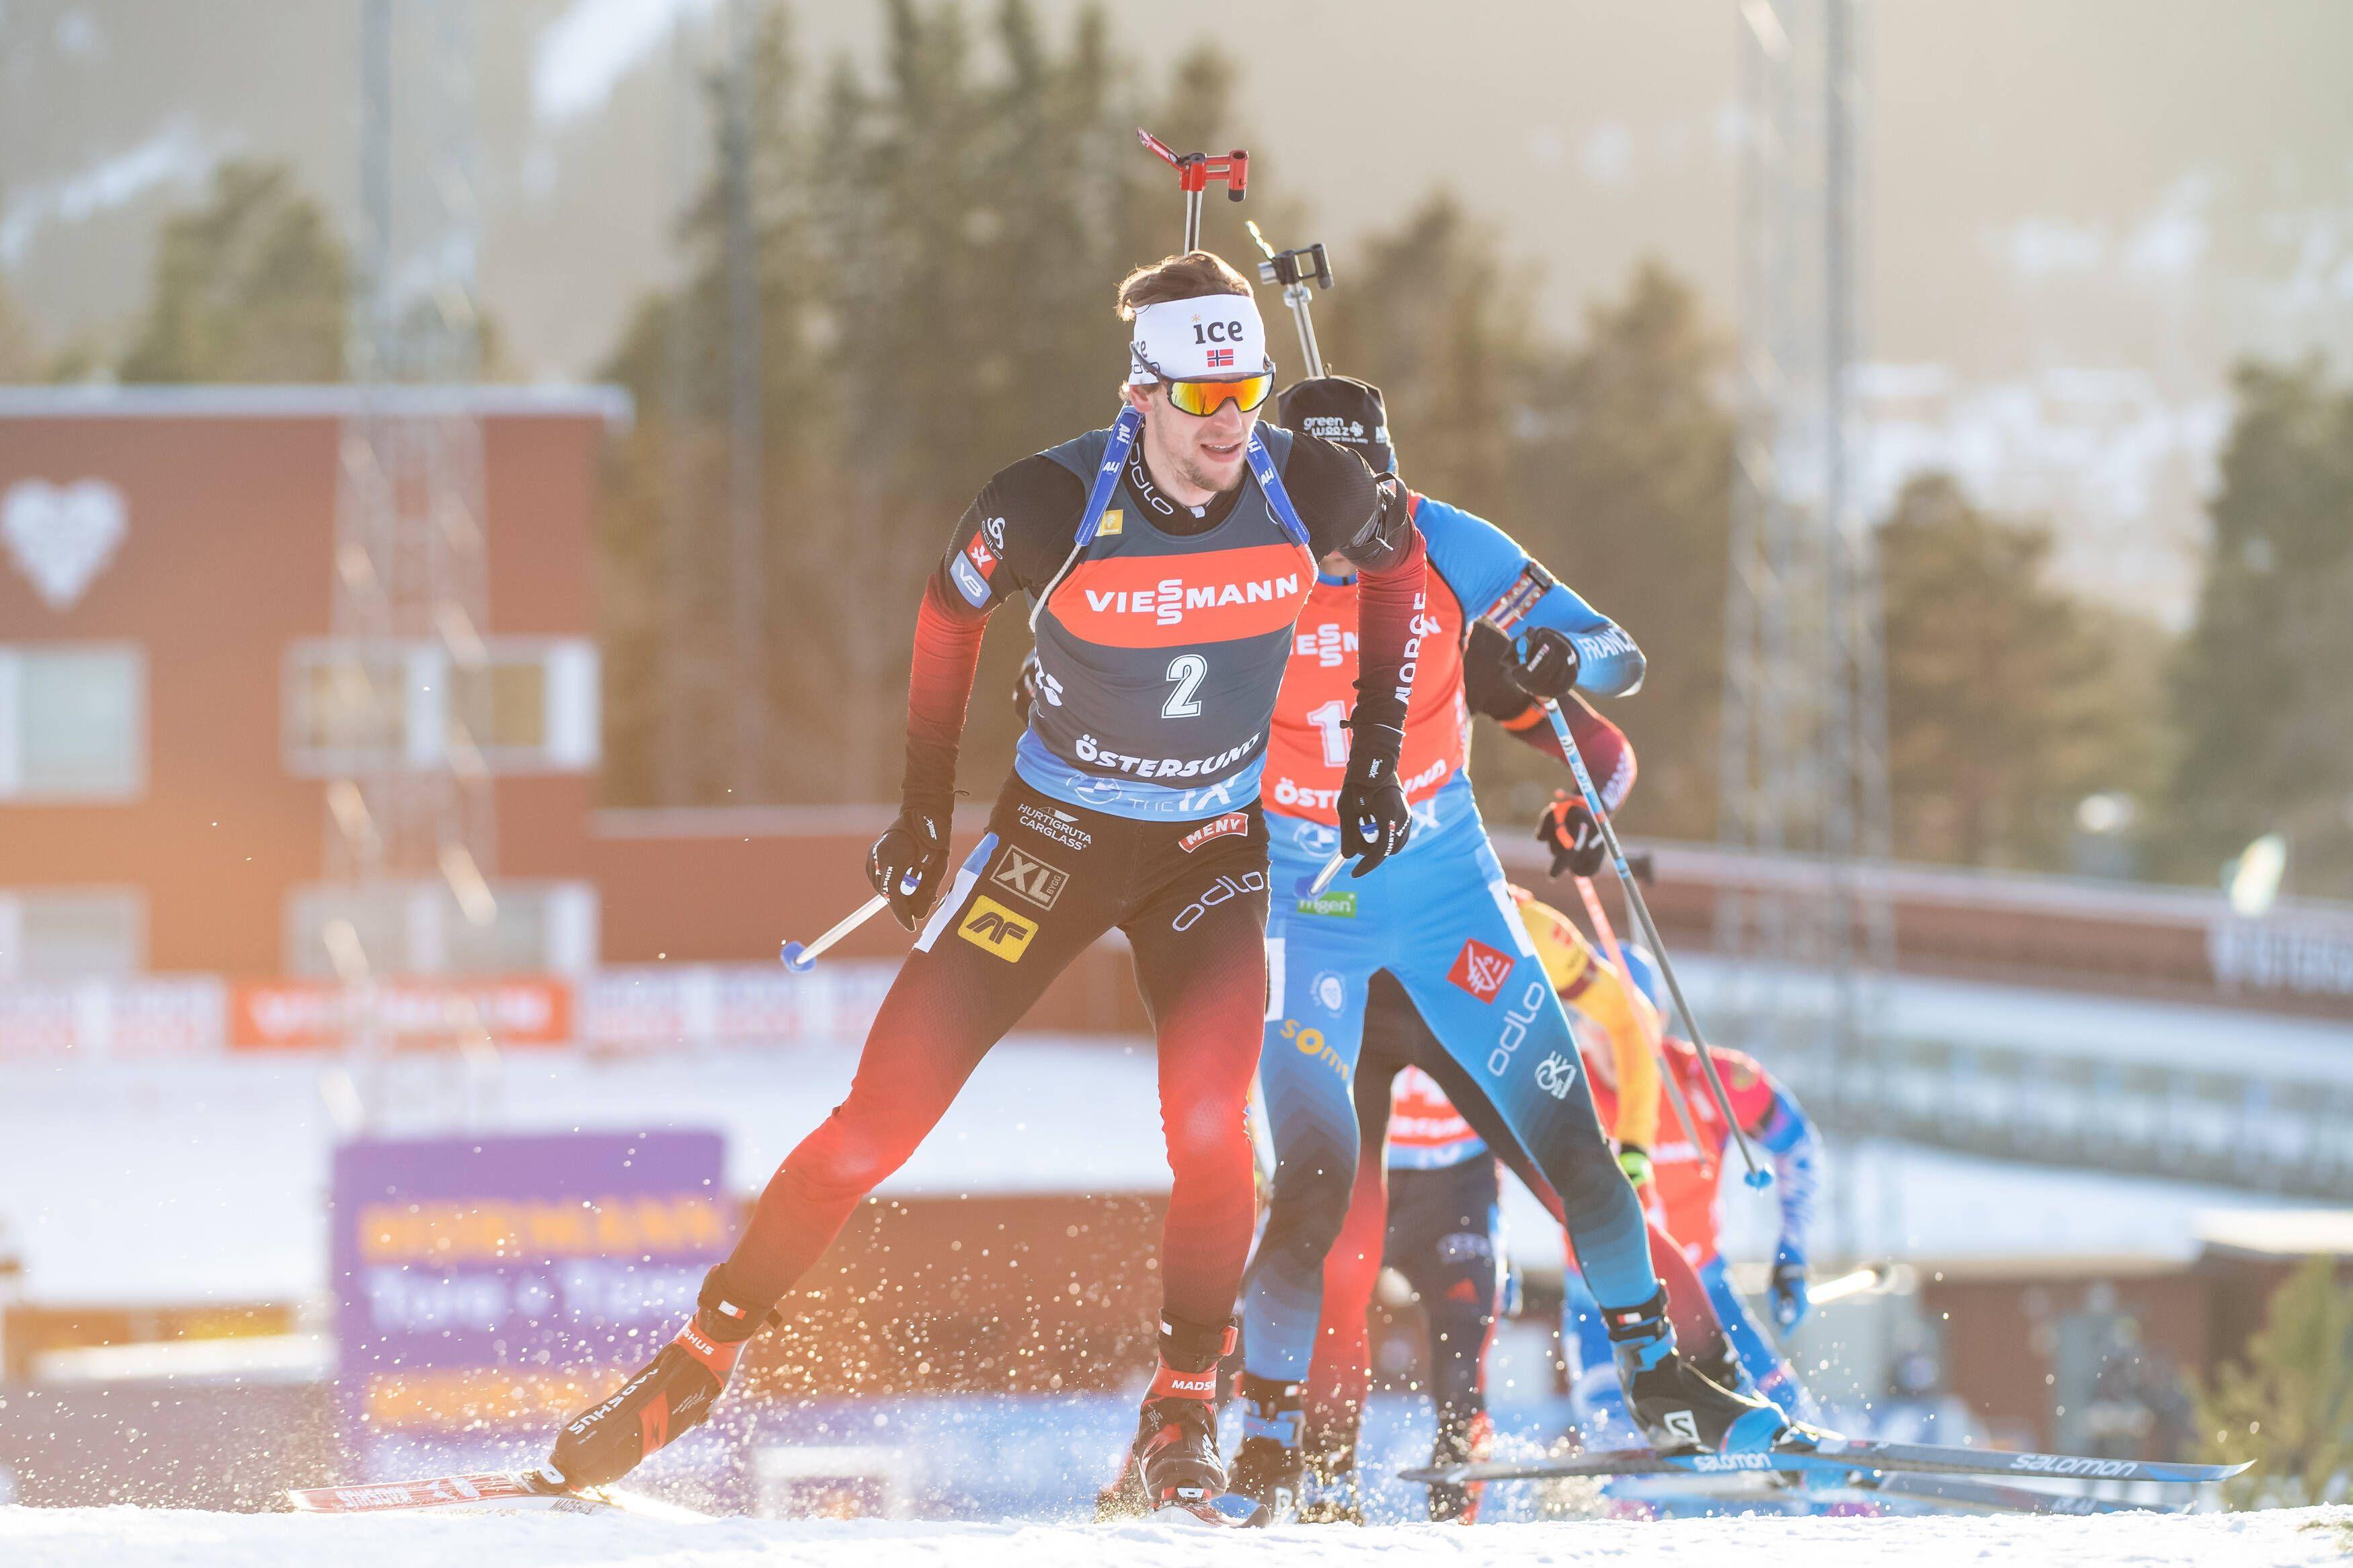 Тренер норвежских биатлонистов обвинил Васильева во лжи